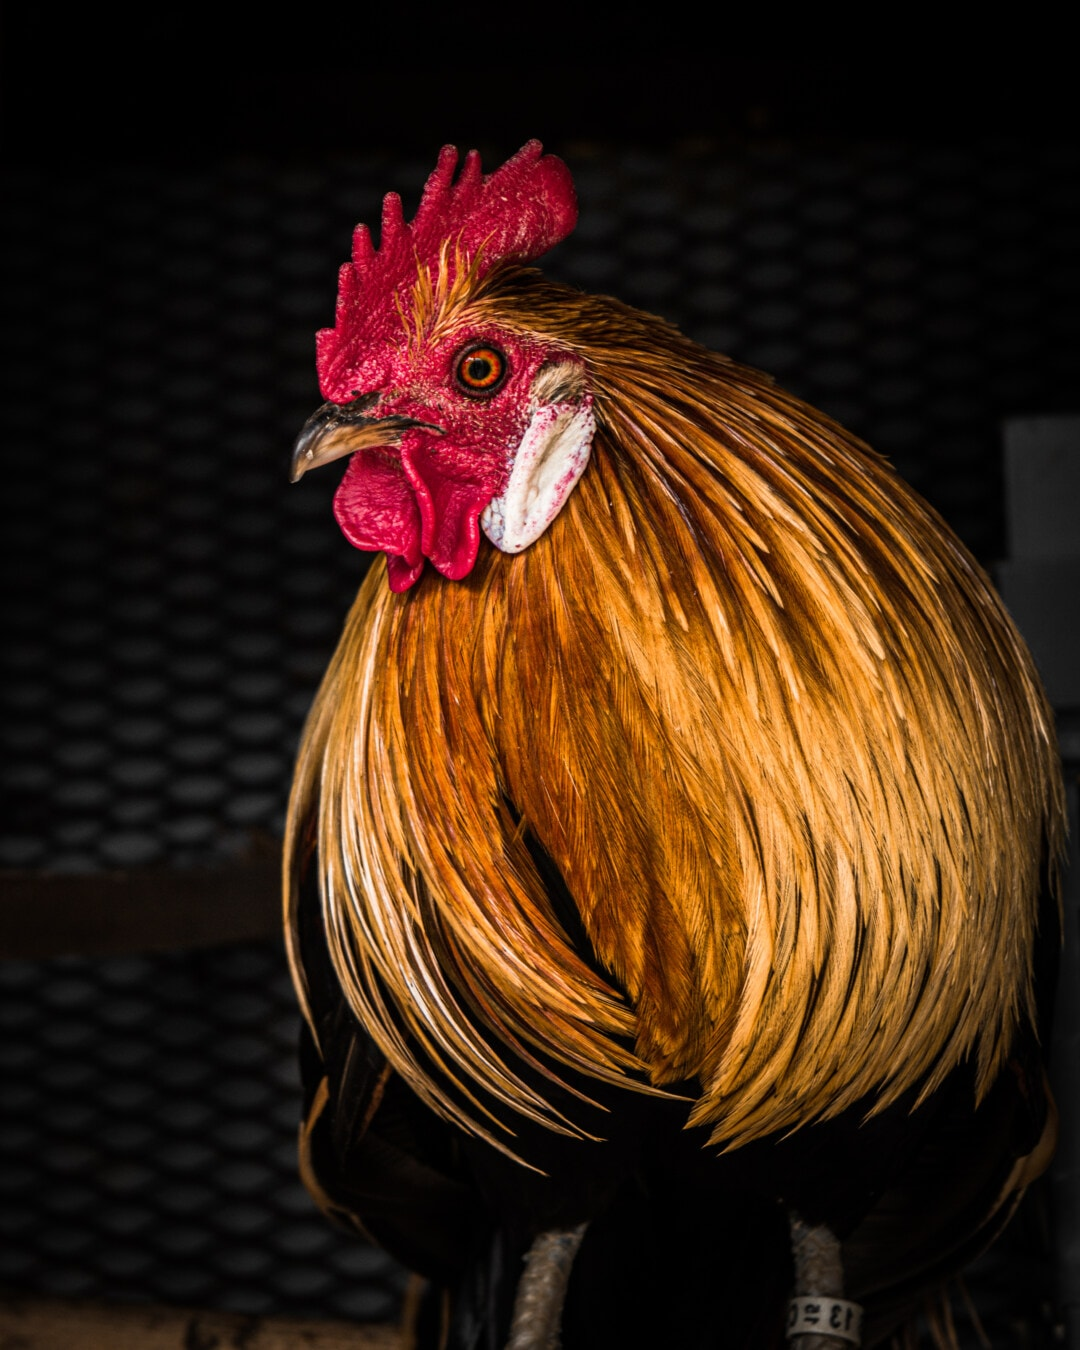 majestic, rooster, crest, head, close-up, chicken, golden glow, orange yellow, feather, bird